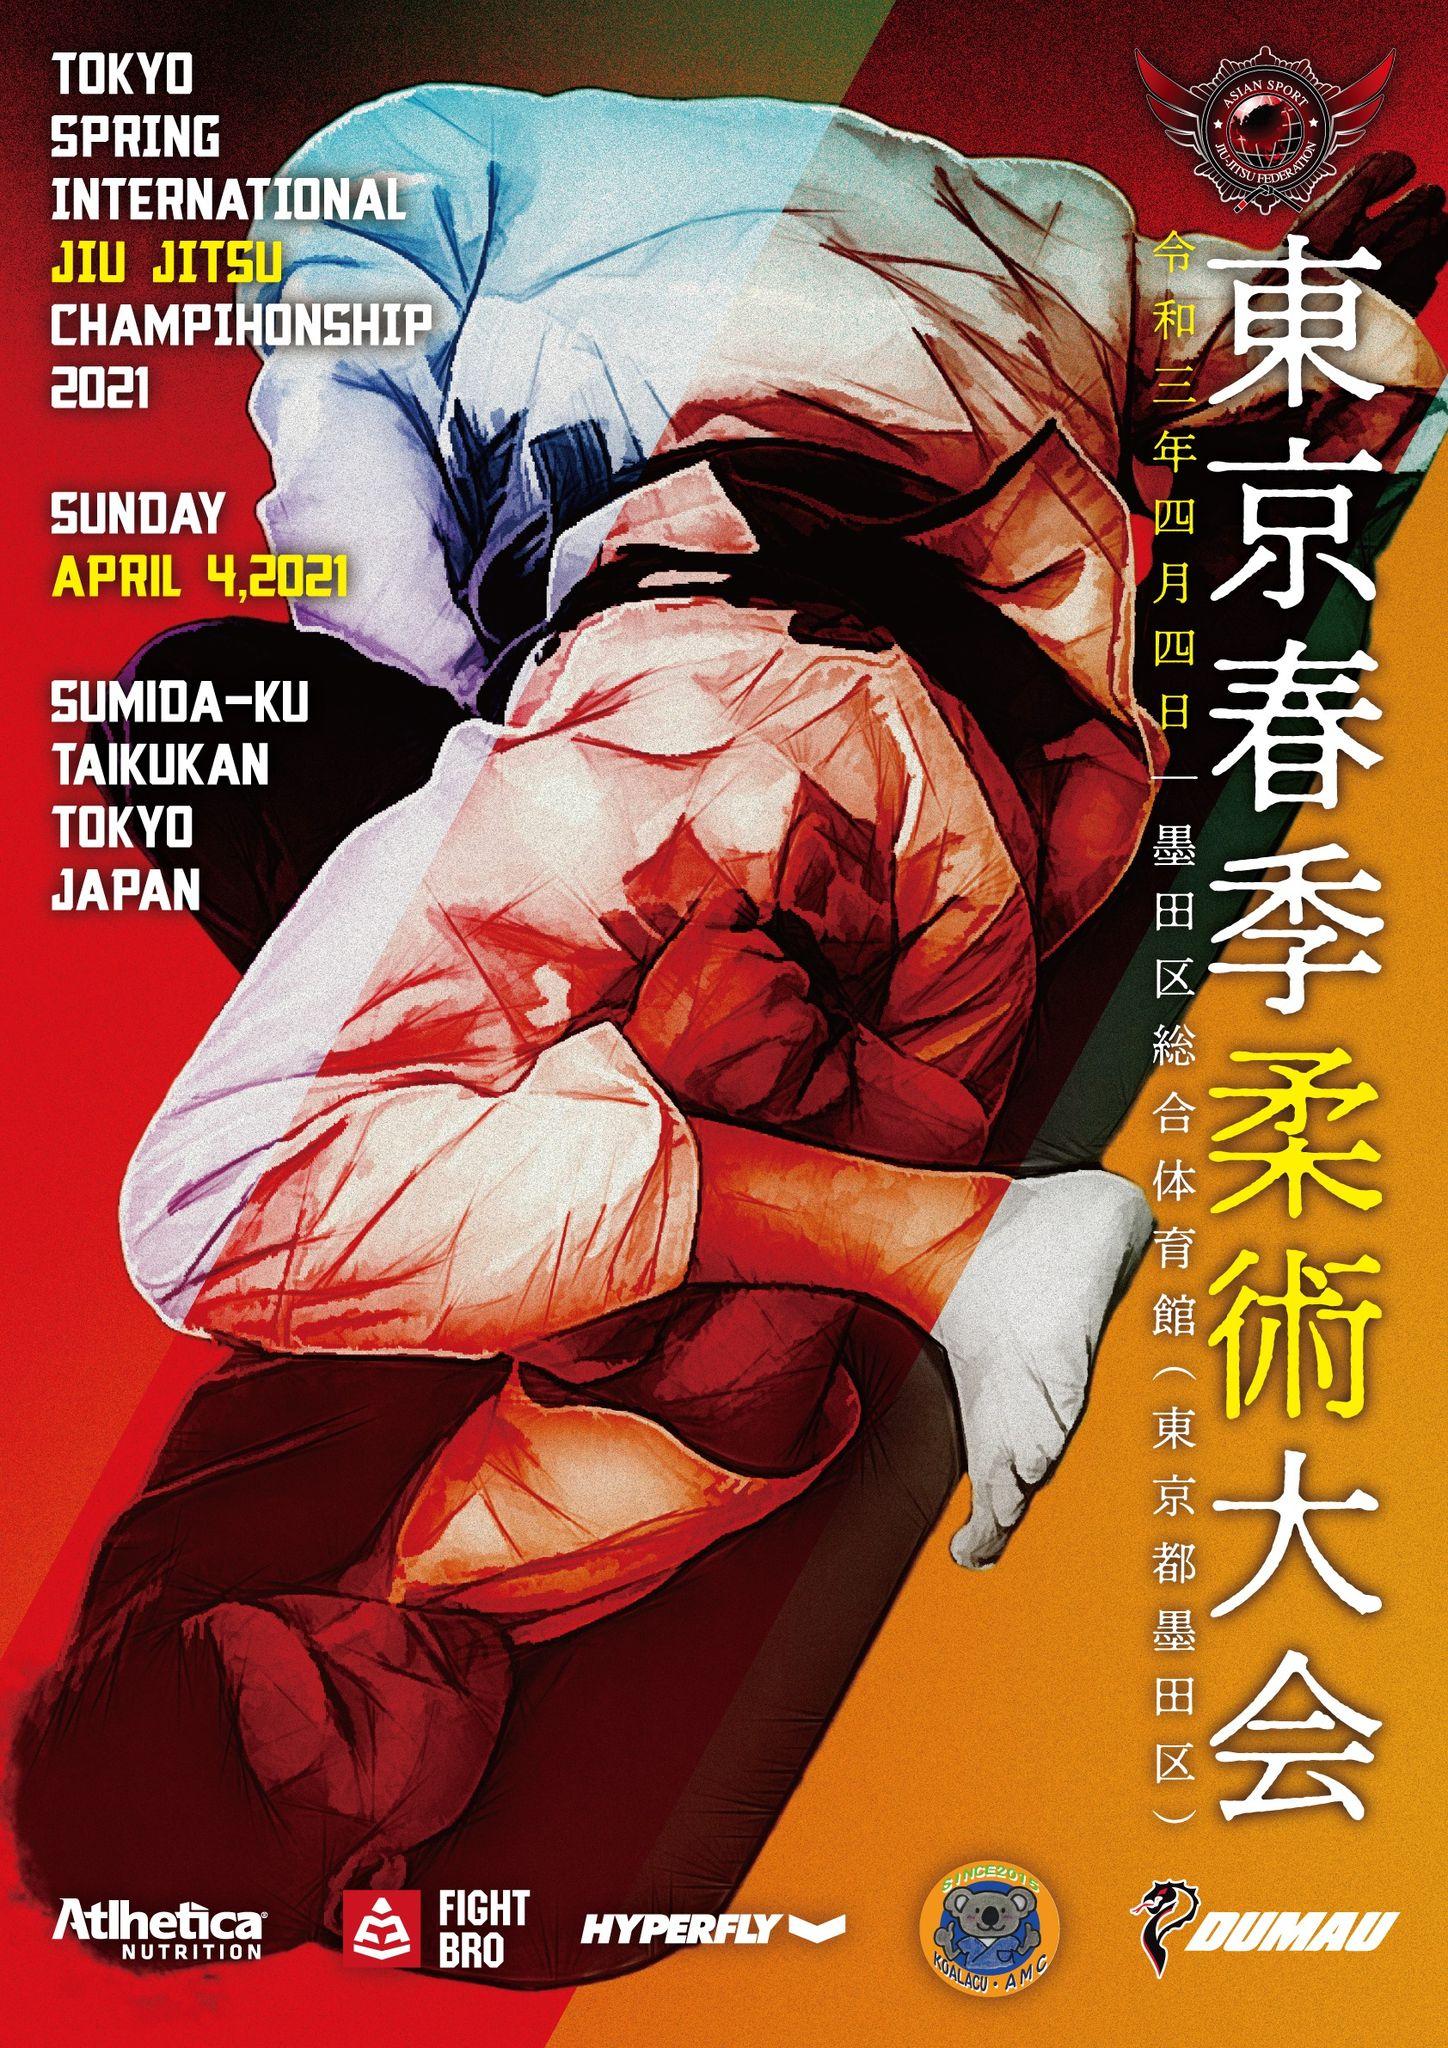 asjjf tokyo spring international jiu jitsu championship 2021 (東京春季柔術大会 2021)